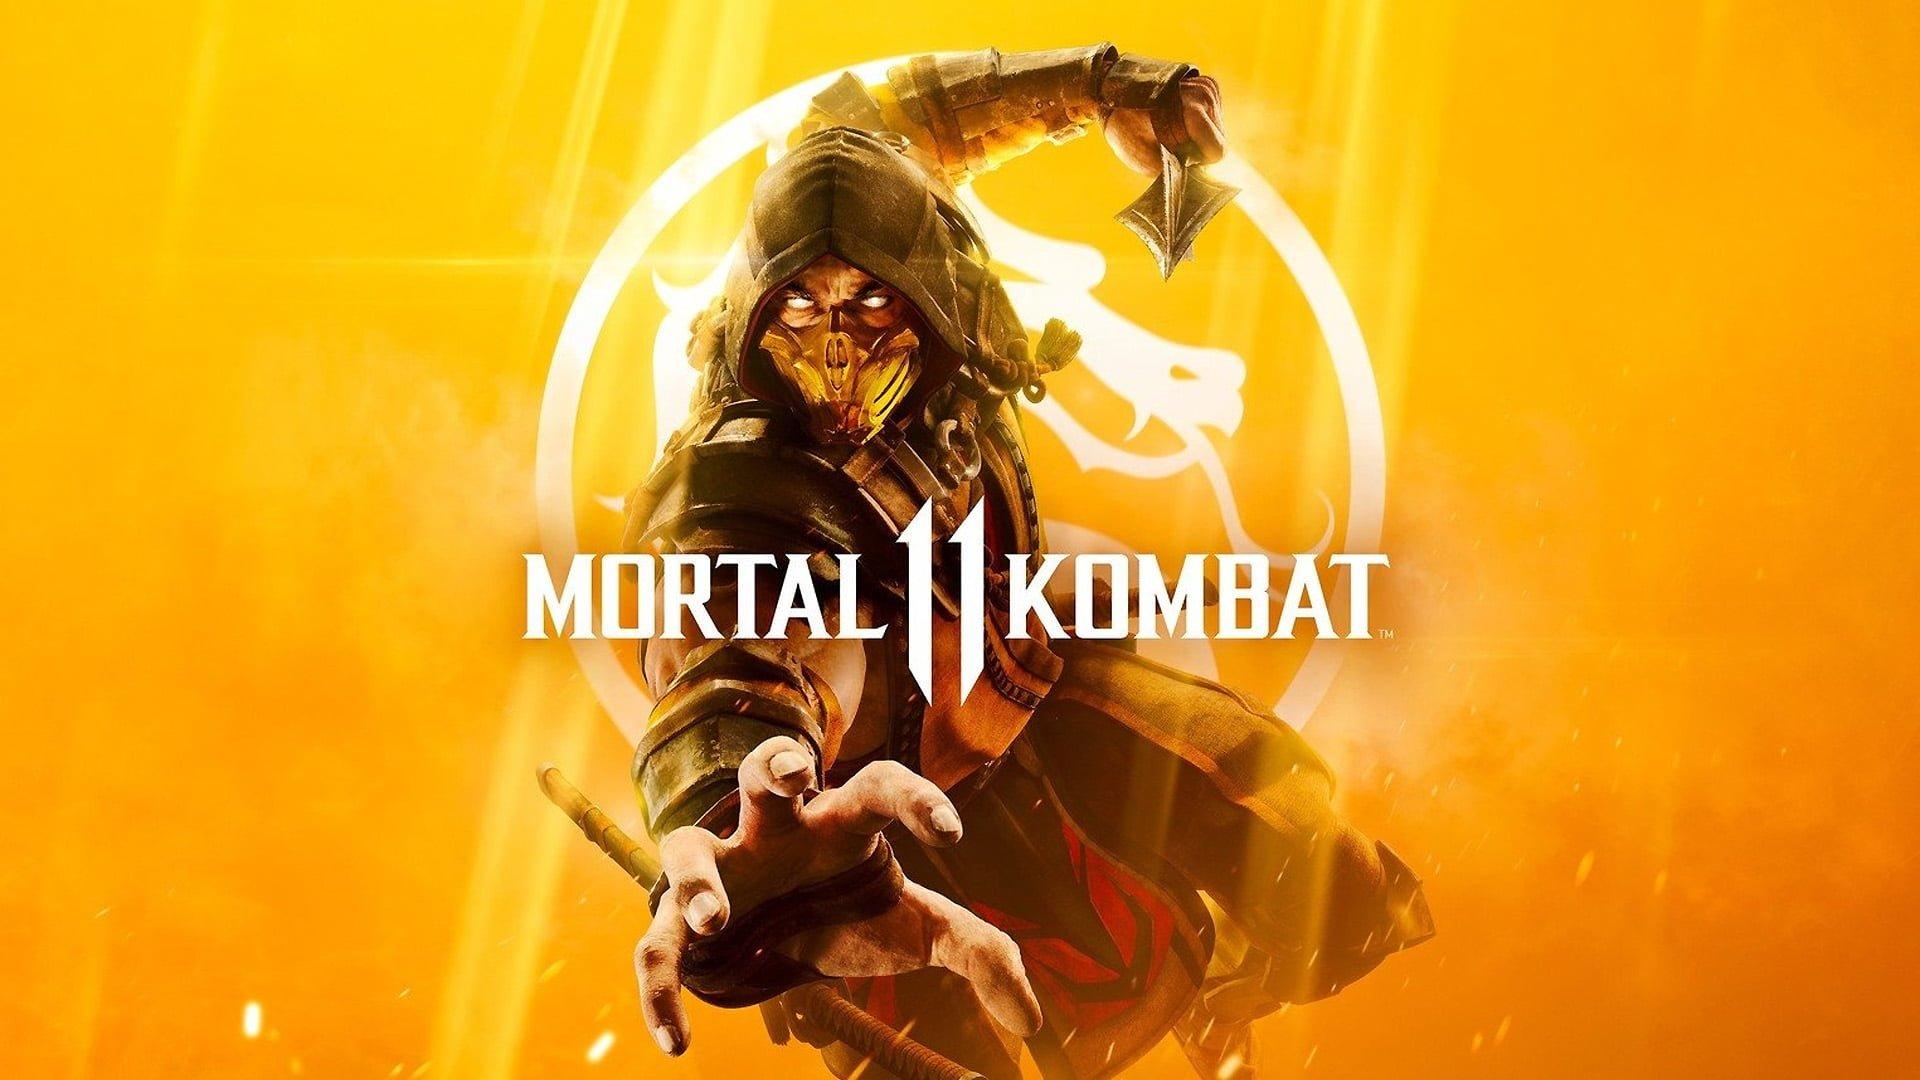 Mortal Kombat 11 - najlepsza bijatyka tej generacji konsol! (recenzja) 19